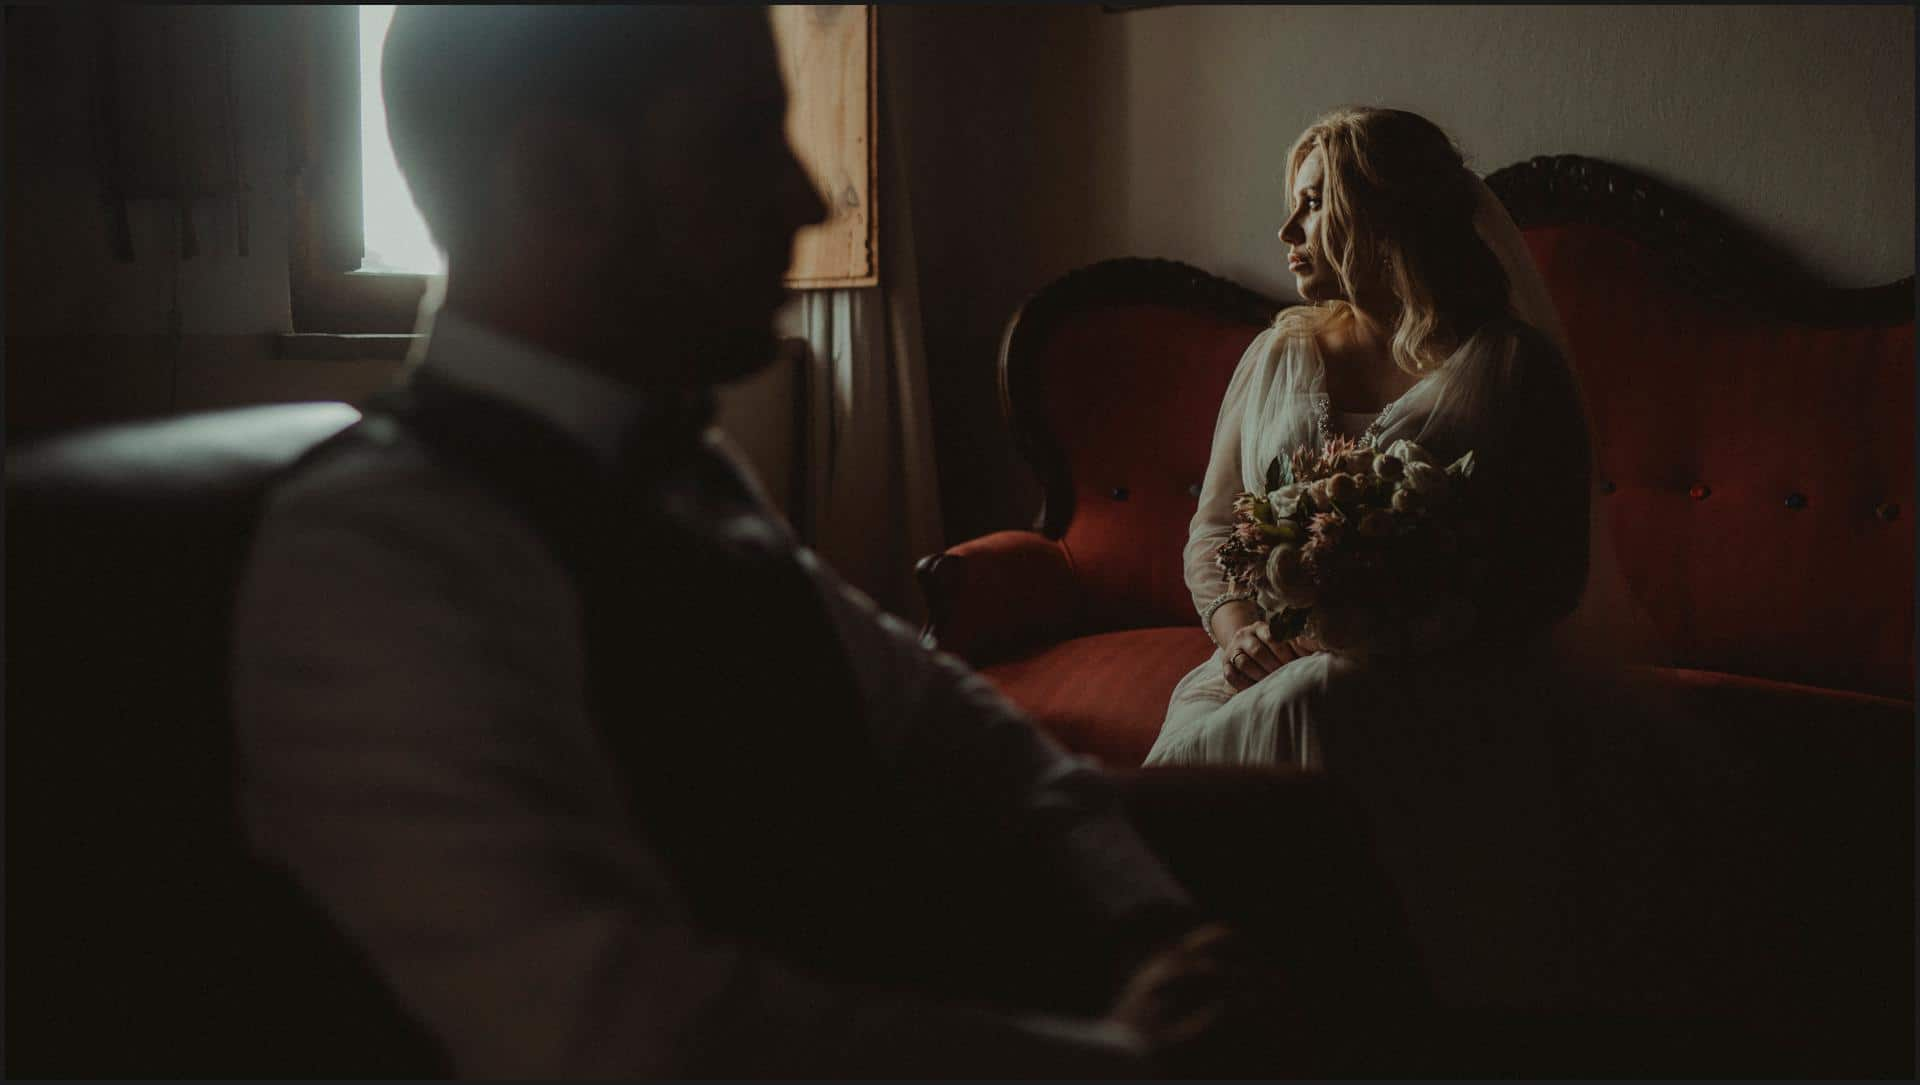 borgo di tragliata, wedding, rome, wedding in rome, bride, groom, italy wedding photographer